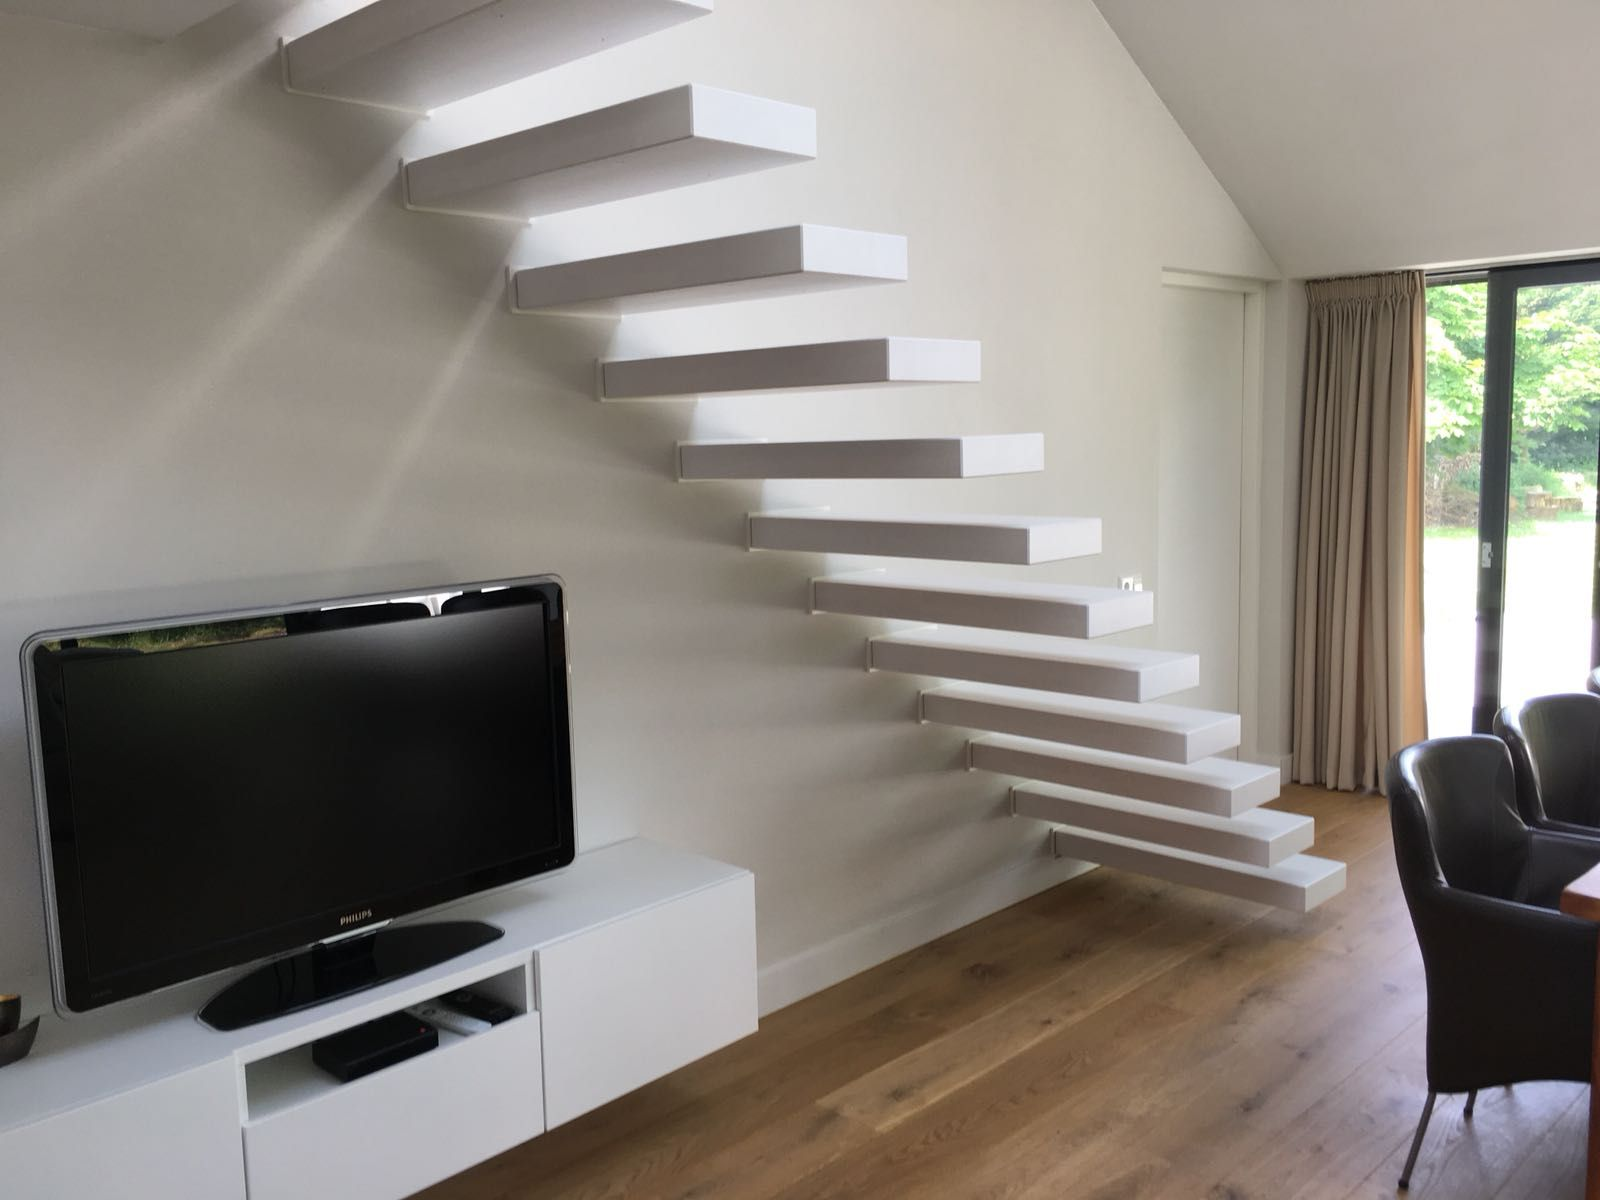 Zwevende Trap Veiligheid : Zwevende trap in wit uitgevoerd cm breed design trappen